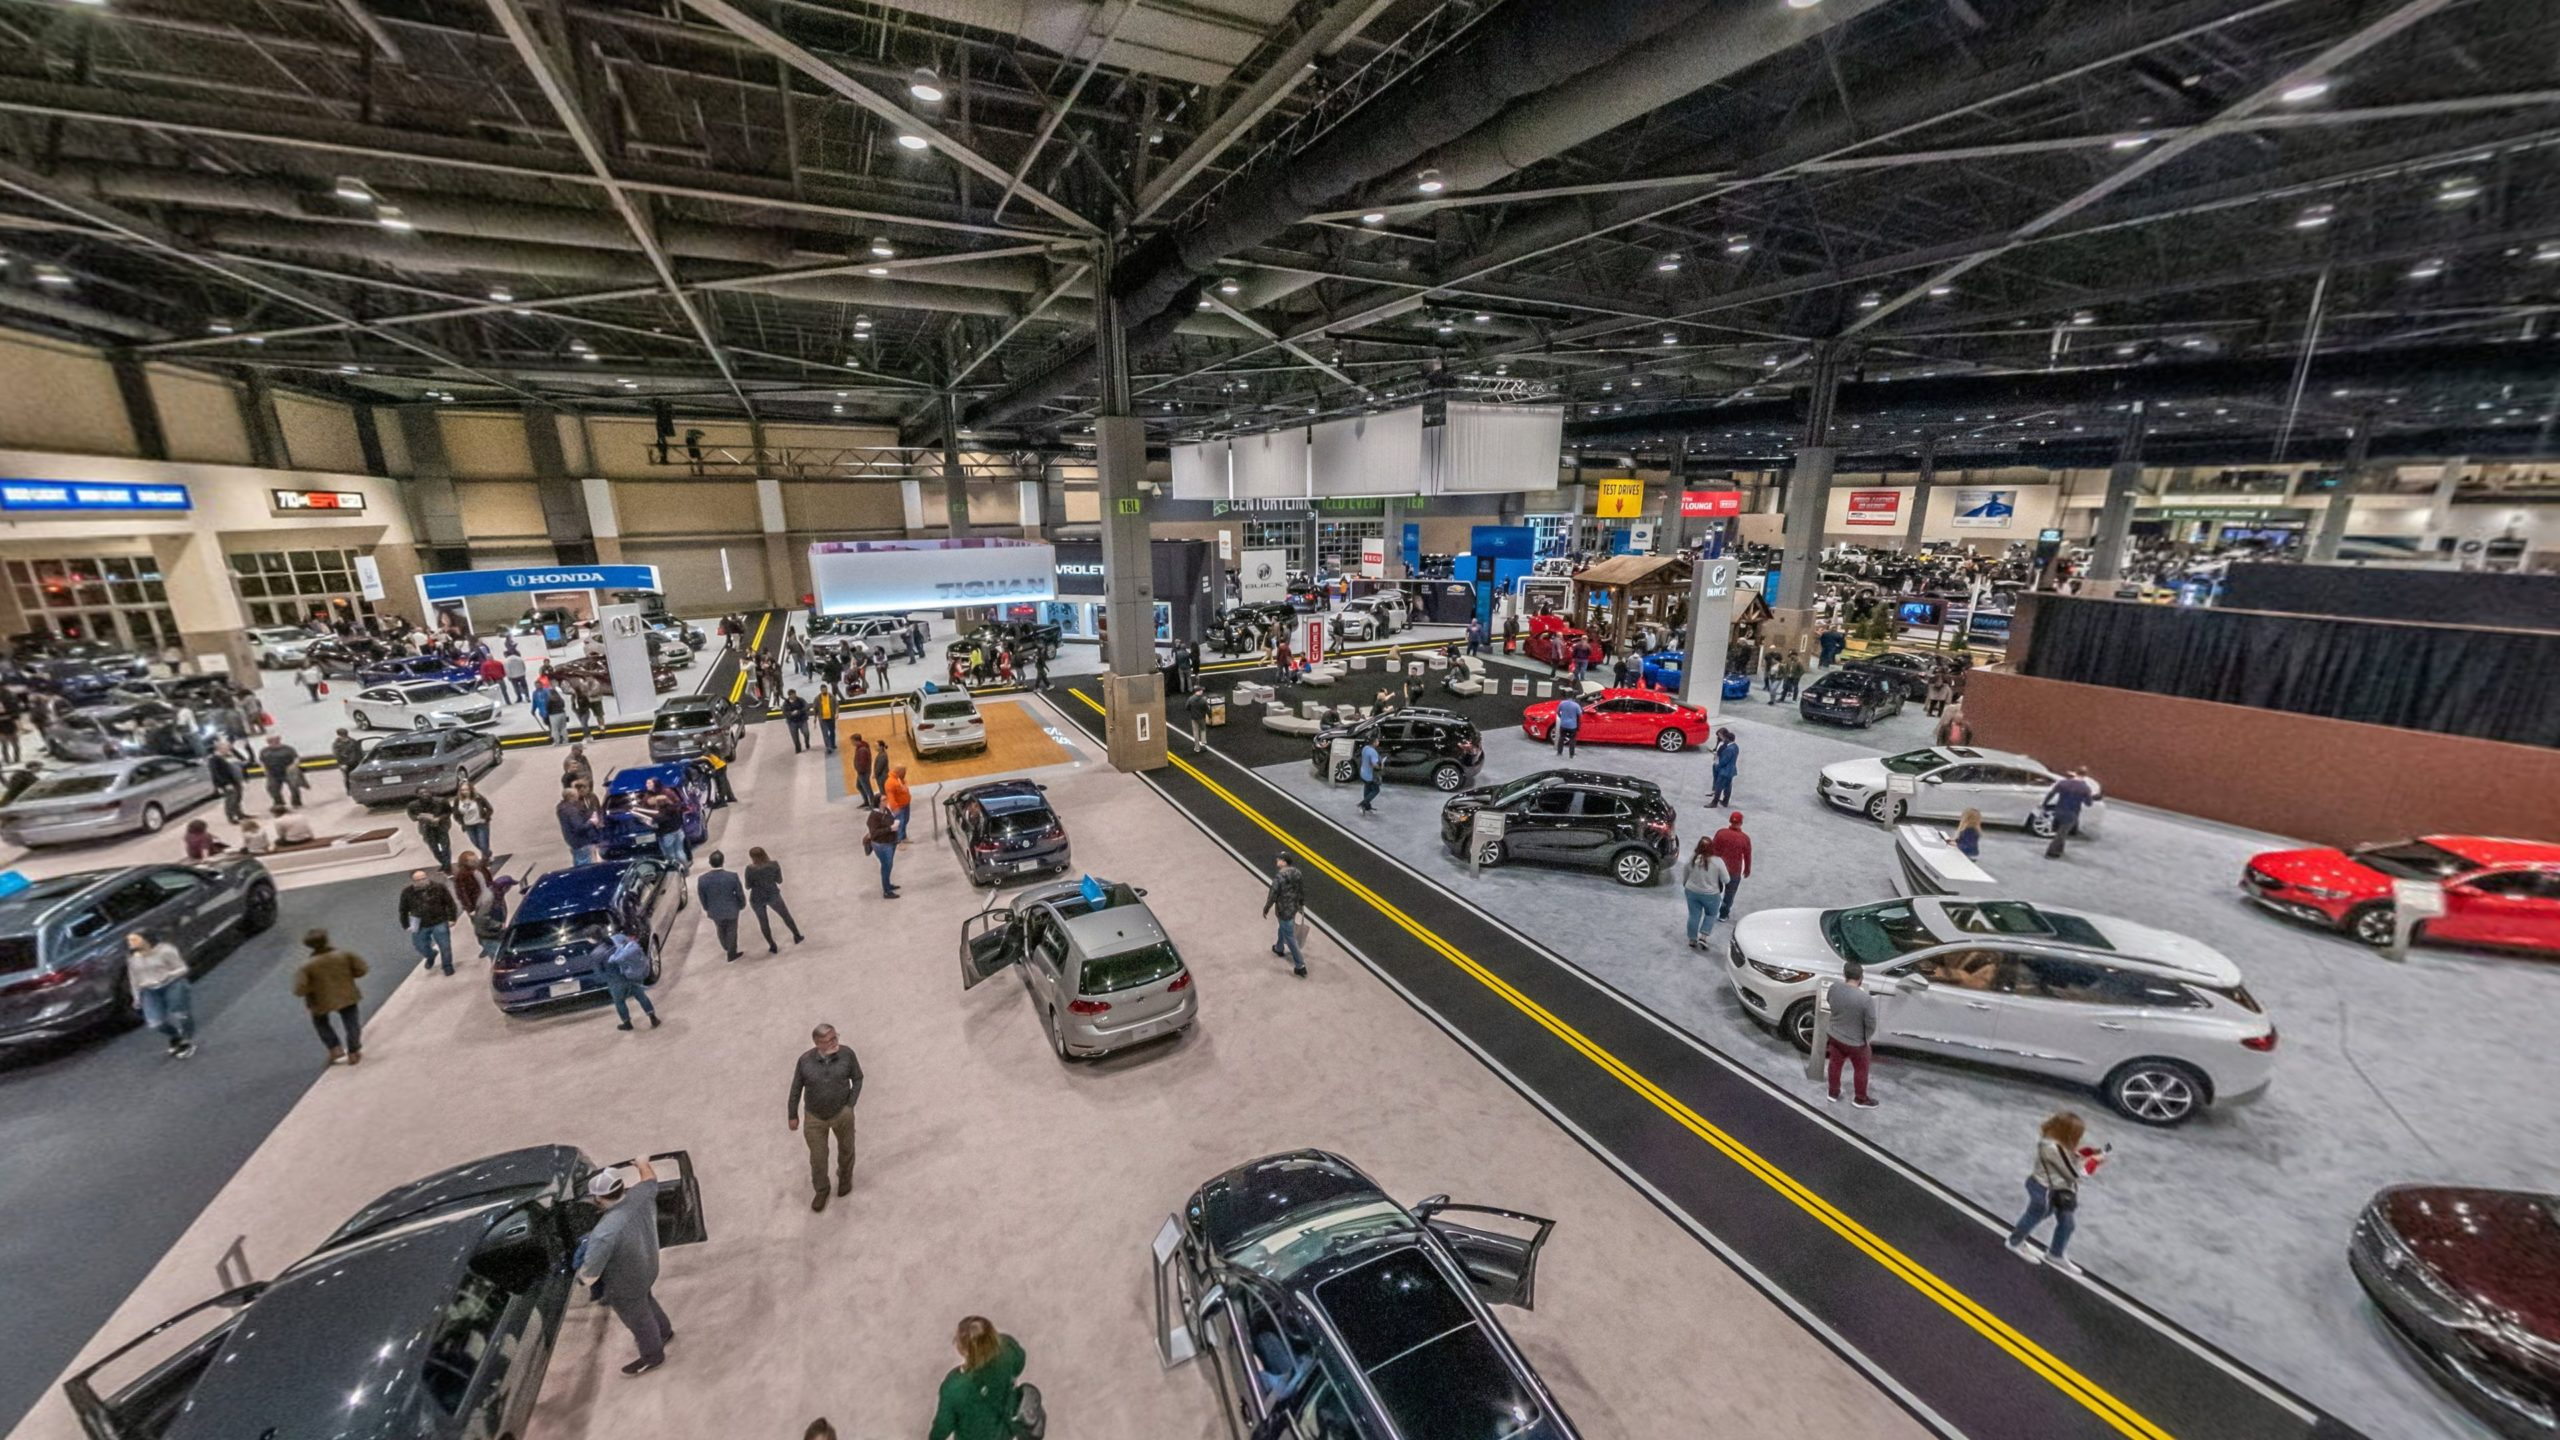 Virtual Tour. Seattle's Annual Showcase of Everything New: Cars, Trucks, Exotics, Luxury & Electrics.